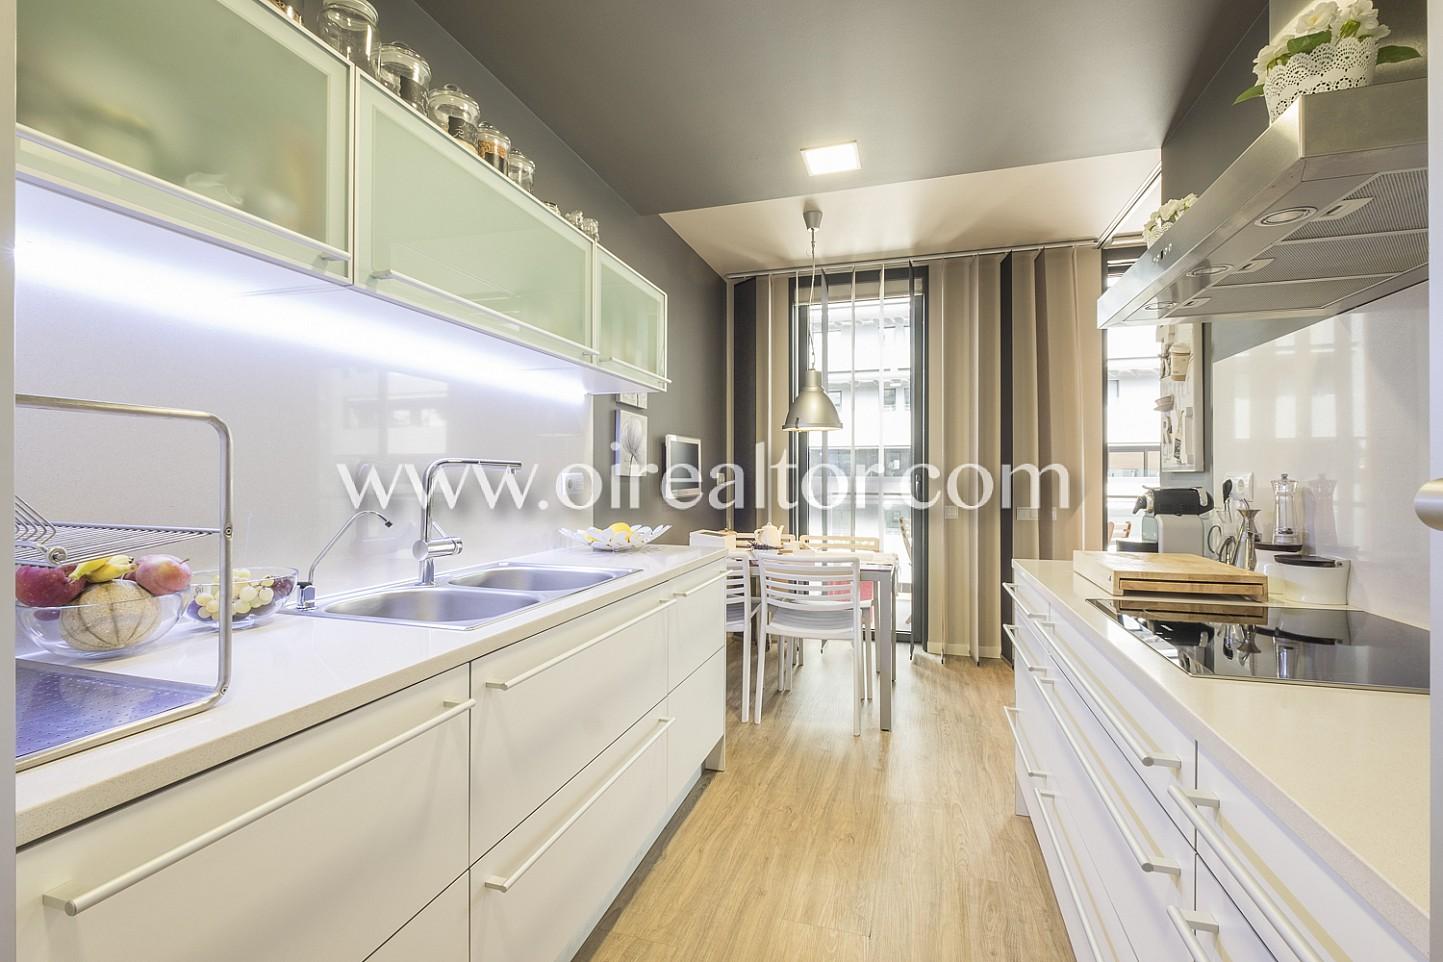 Cocina, cocina office, office, cocina con office, electrodomésticos, cocina con electrodomésticos